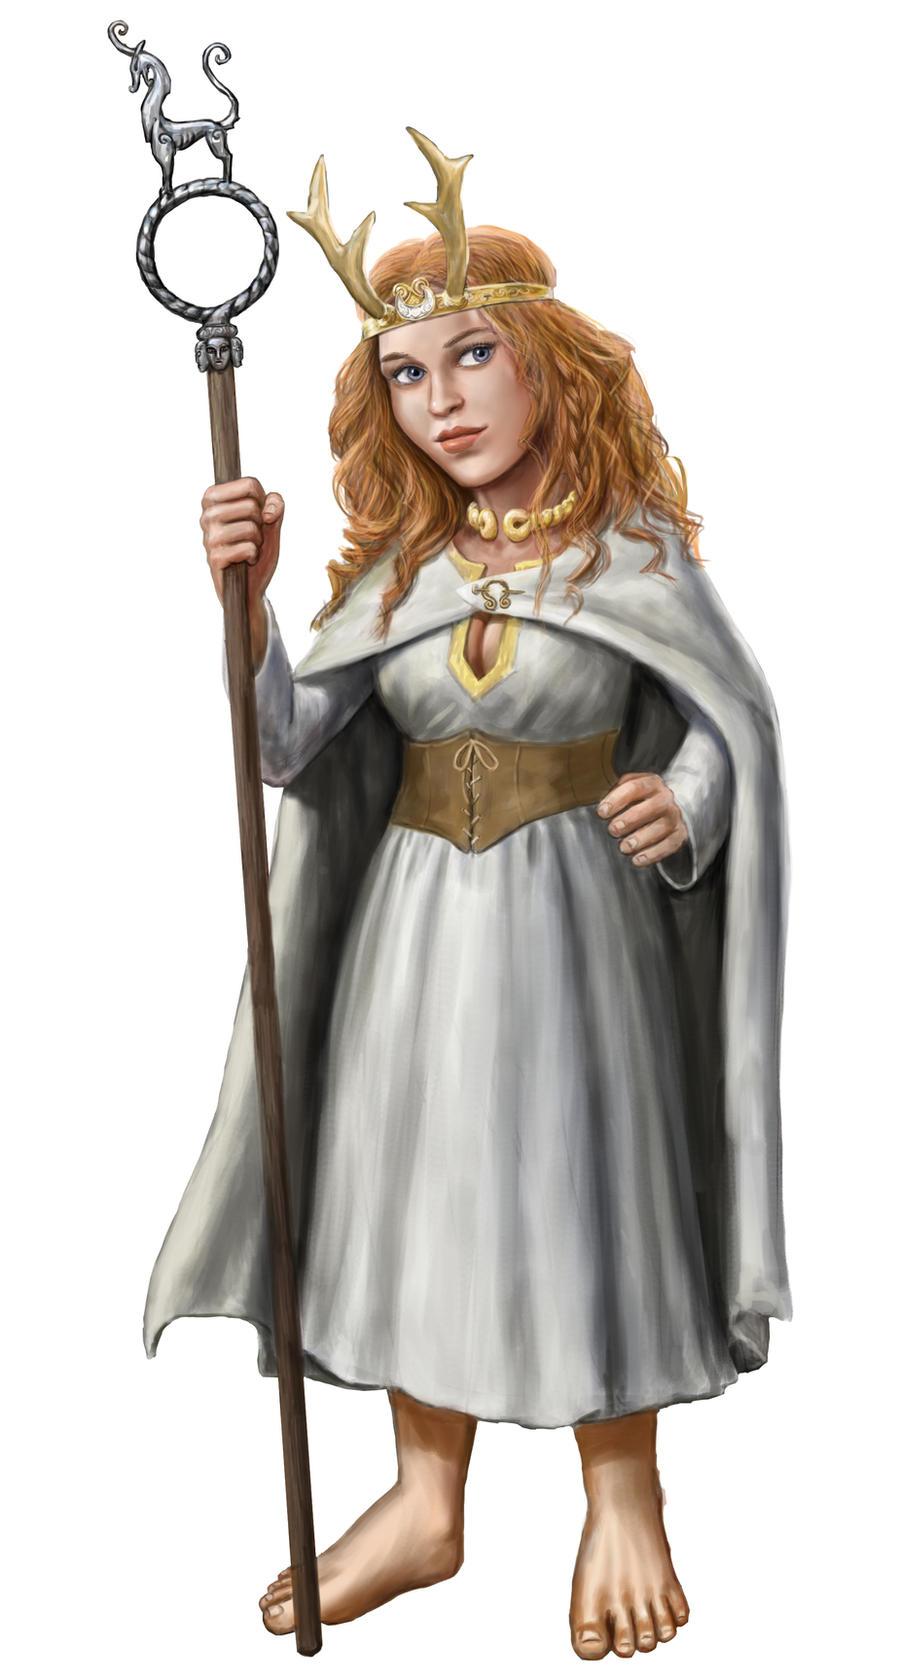 http://img03.deviantart.net/2755/i/2017/057/c/1/fantasy_hobbit_druidess_by_dashinvaine-db0hosw.jpg